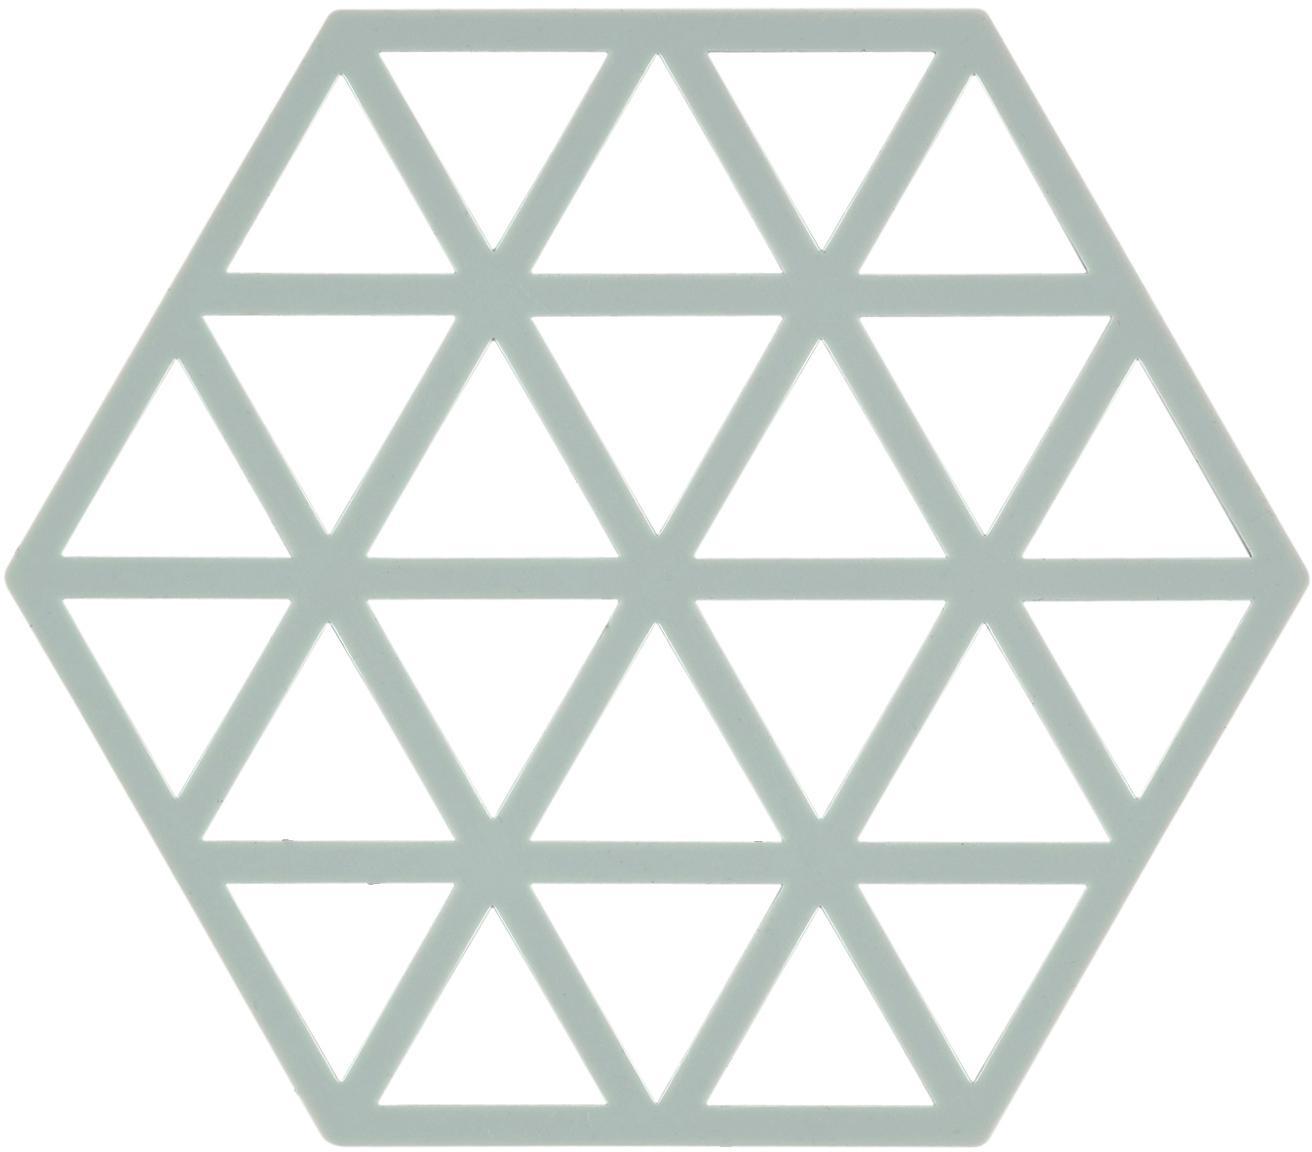 Sottopentola in silicone Triangle 2 pz, Silicone, Blu pastello, Larg. 14 x Prof. 16 cm